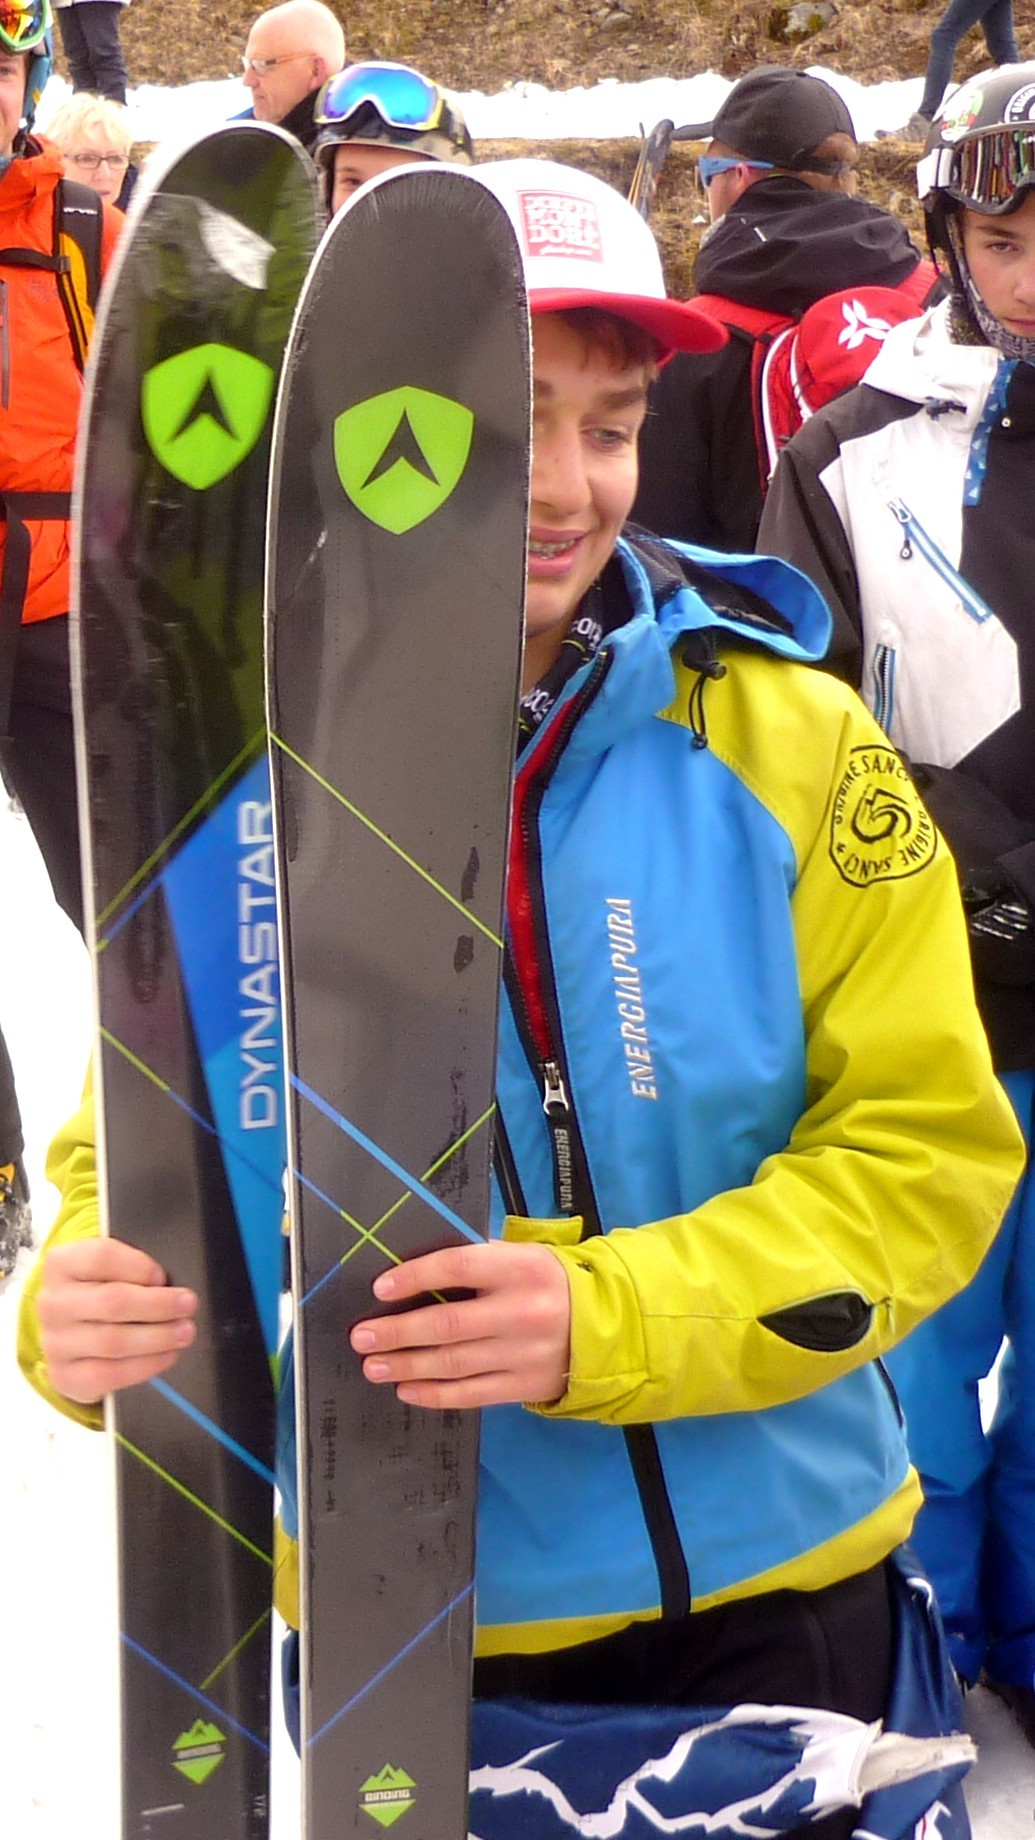 Gagnant ski Dynastar CHAM 97 - Derby du Mont Dore 2017